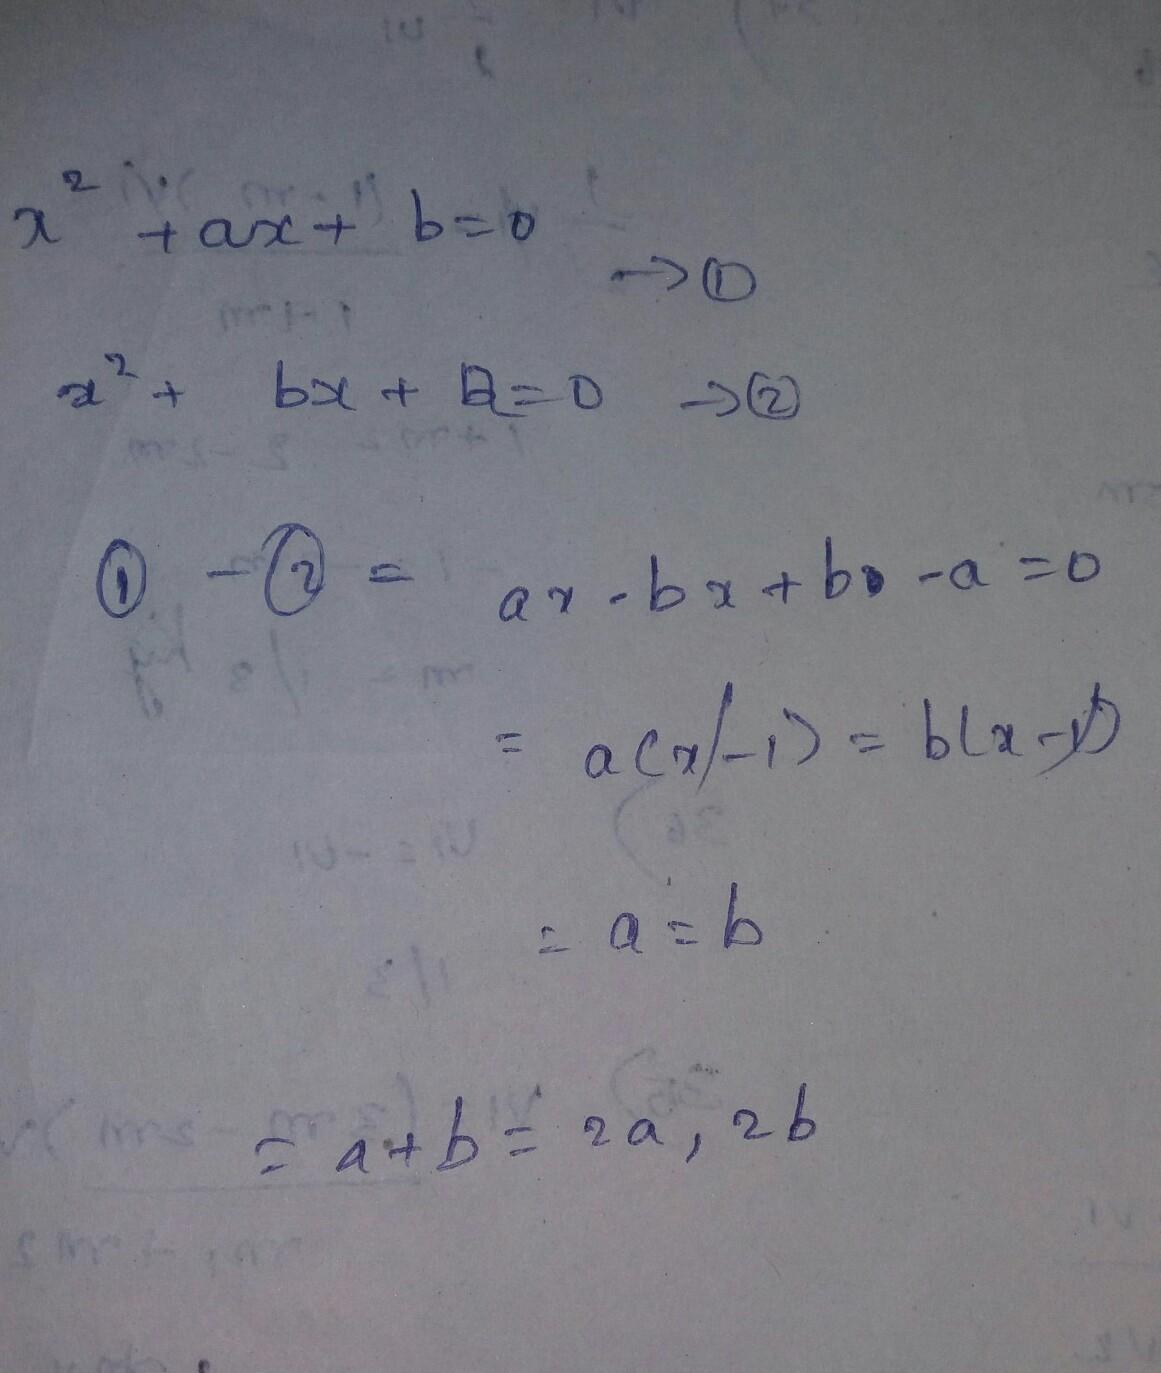 If The Quadratic Equations X2+ax+b=0 : X2+bx+a=0 Have